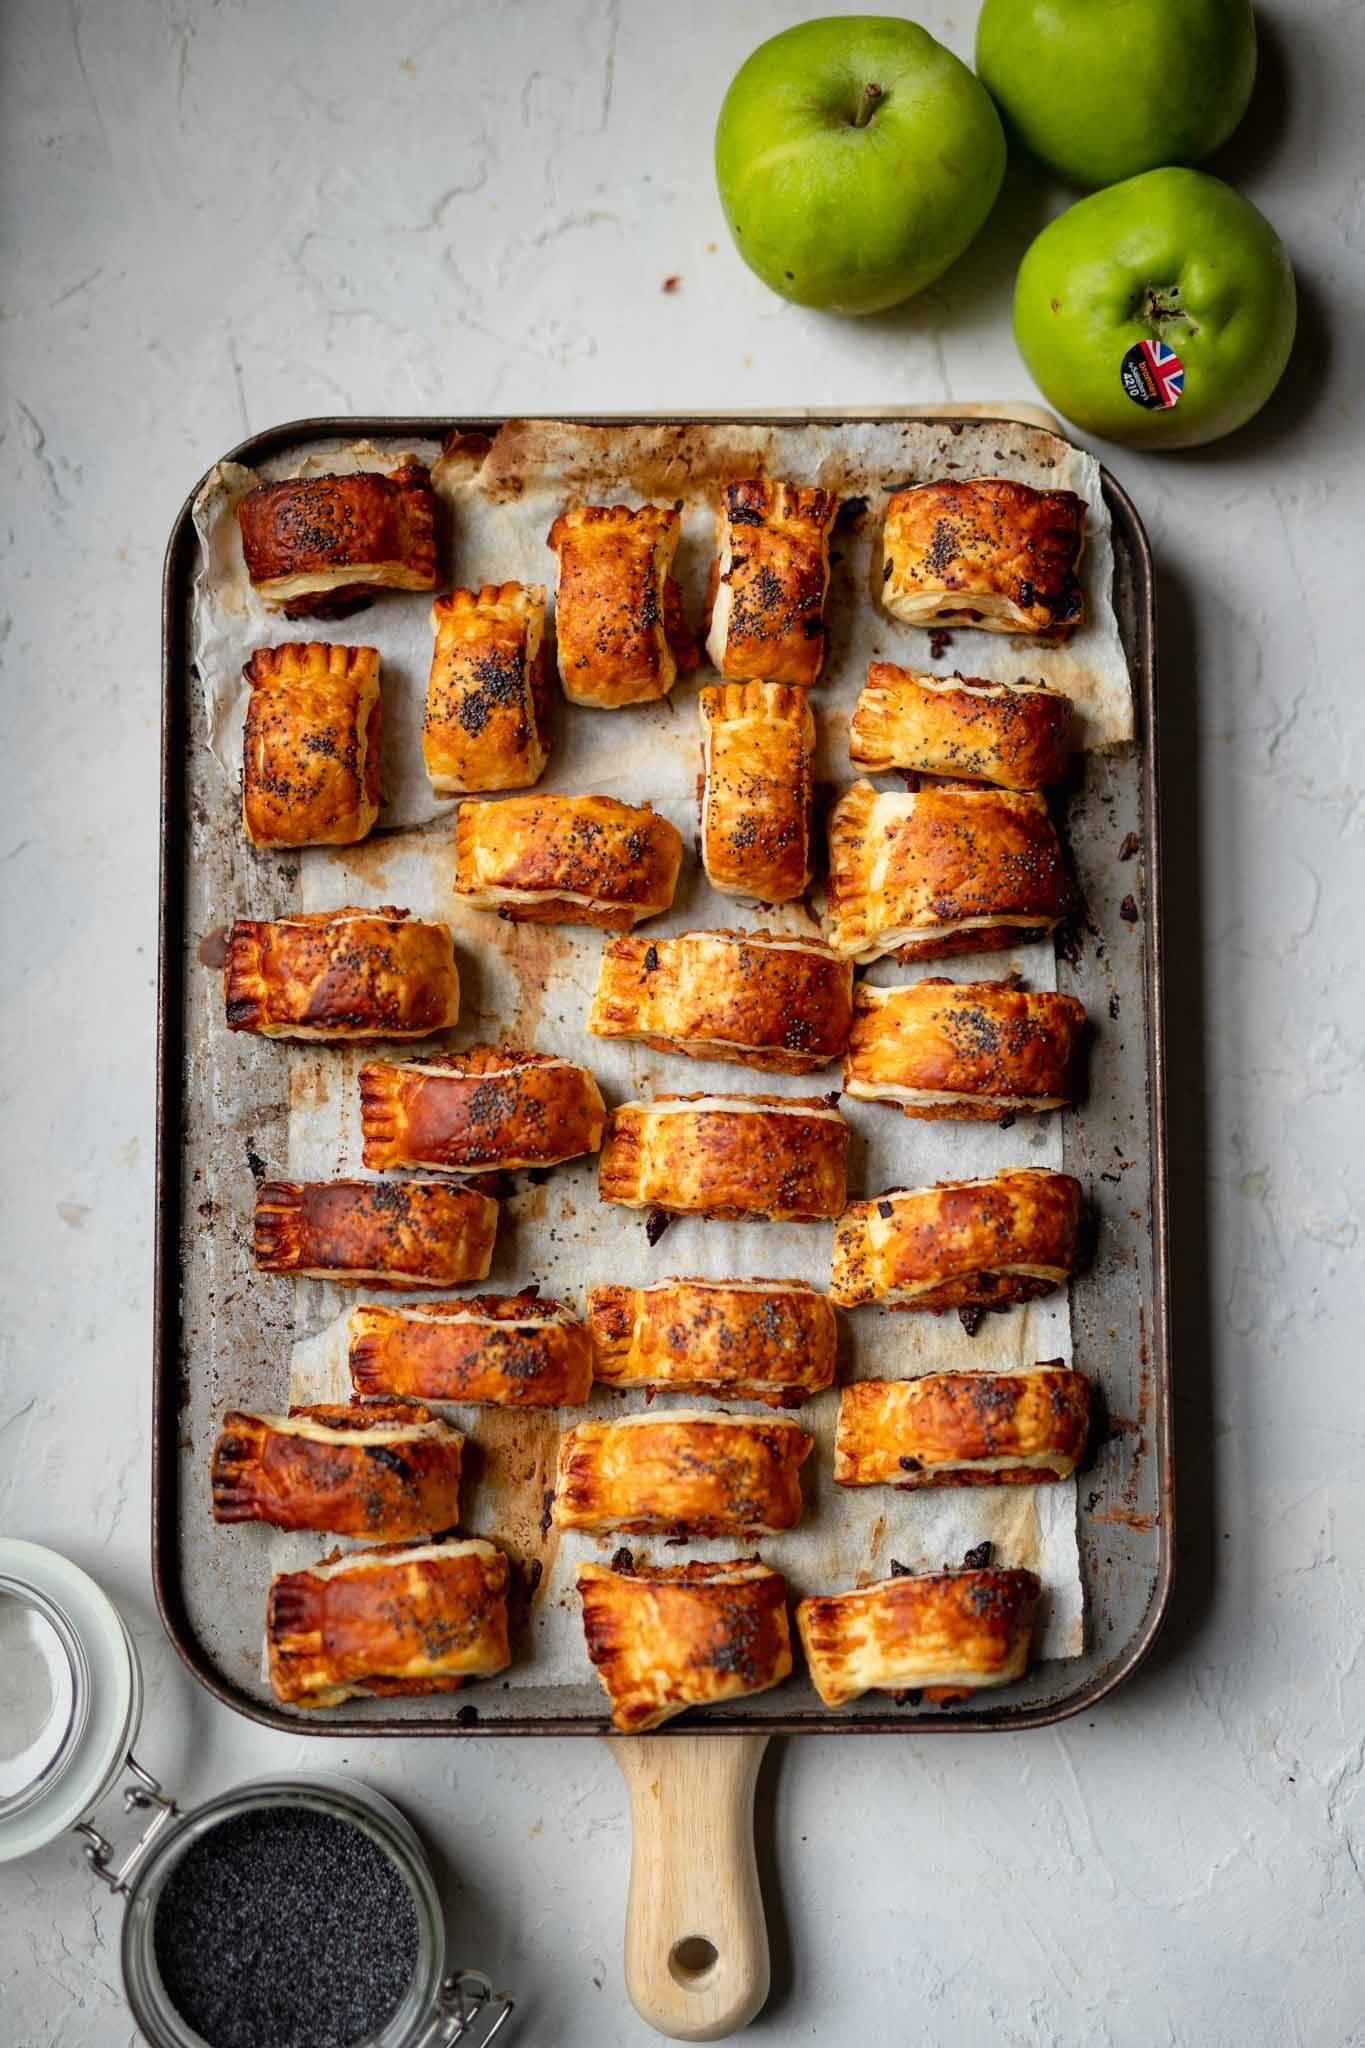 vegan apple and pork sausage rolls